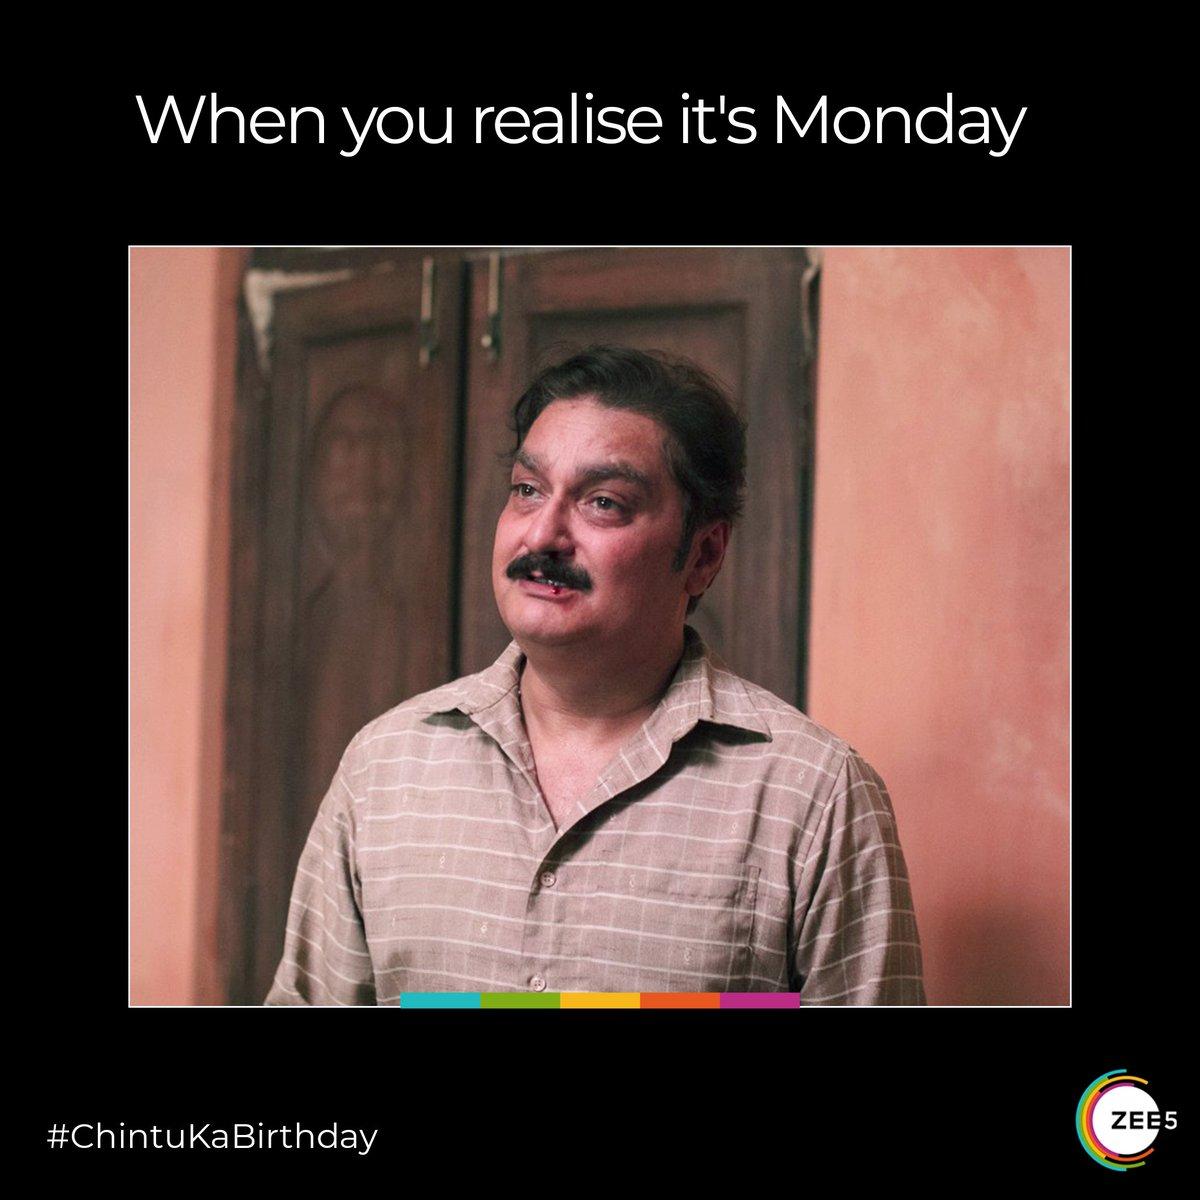 Chintu ke papa is here to drive away your Monday blues.  Hit Like if you are as excited as him to celebrate  #ChintuKaBirthday on 5th June.  @FirstDraft_Ent @mojorojo @KDevanshuSingh @satysingh @thetanmay @stupidusmaximus @pathakvinay @TillotamaShome @ReginaldLBarnes @NateScholz https://t.co/0puEKsSjSJ